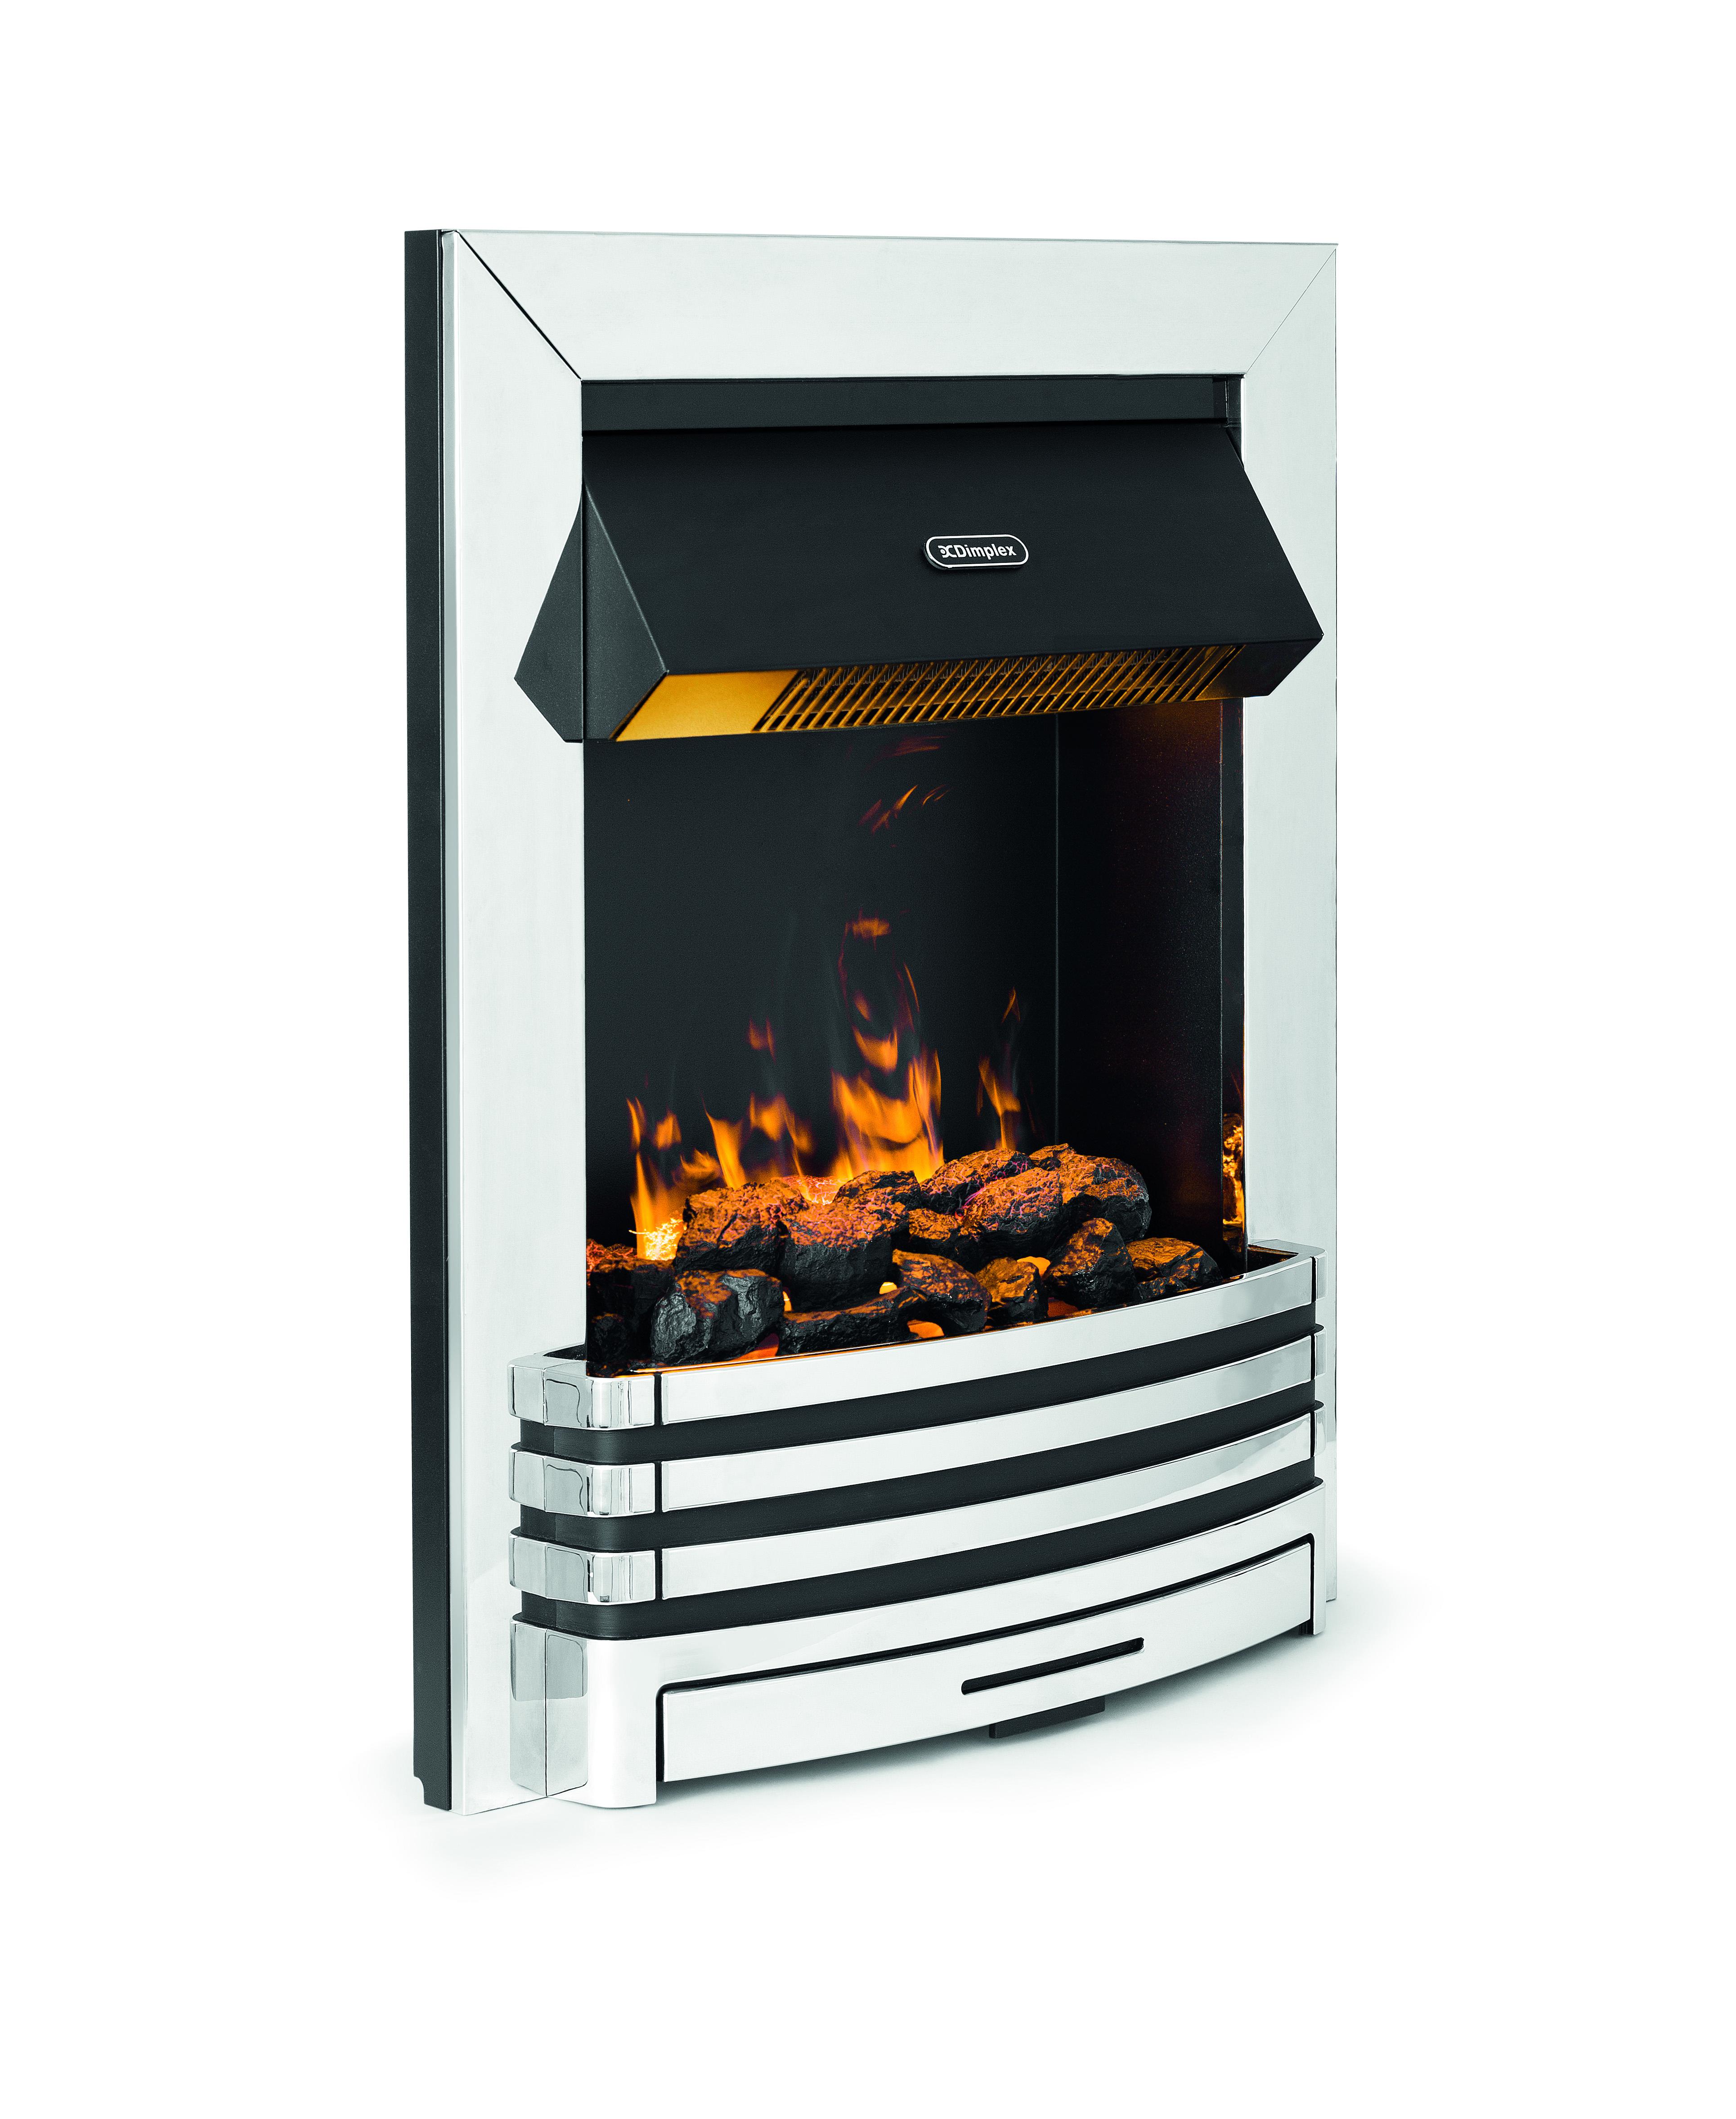 profileid opti brayden product dimplex item only member id ae myst fireplace imageservice recipeid